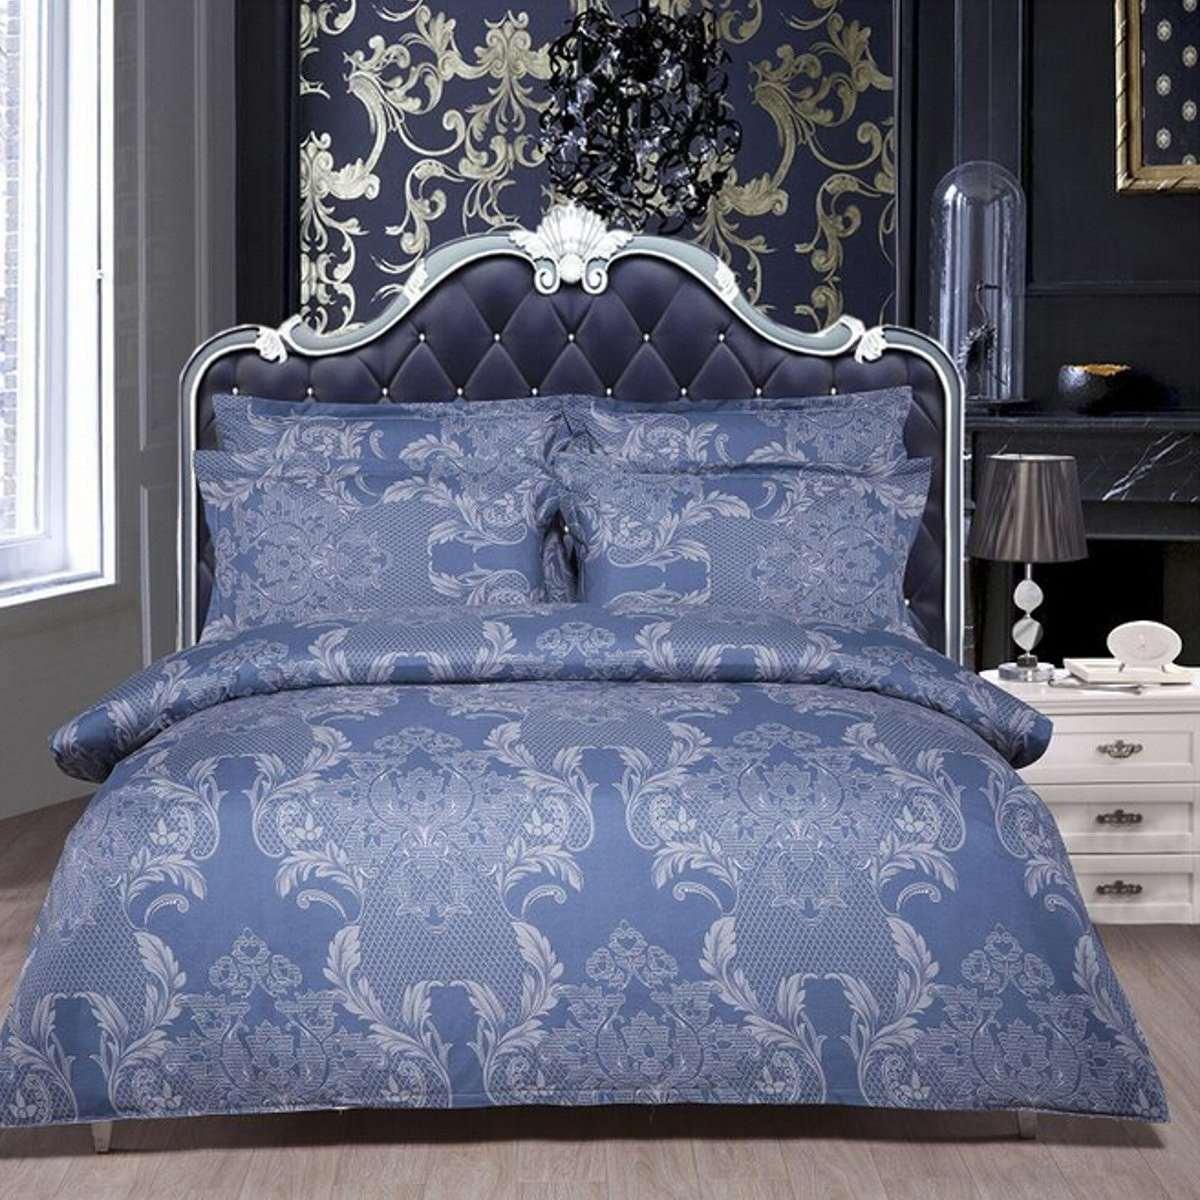 Luxury Vintage Pattern Blue Foral Print Bedding Sets Single Double King Size Polycotton Pillowcases Quilt Duvet Cover Bedsheet